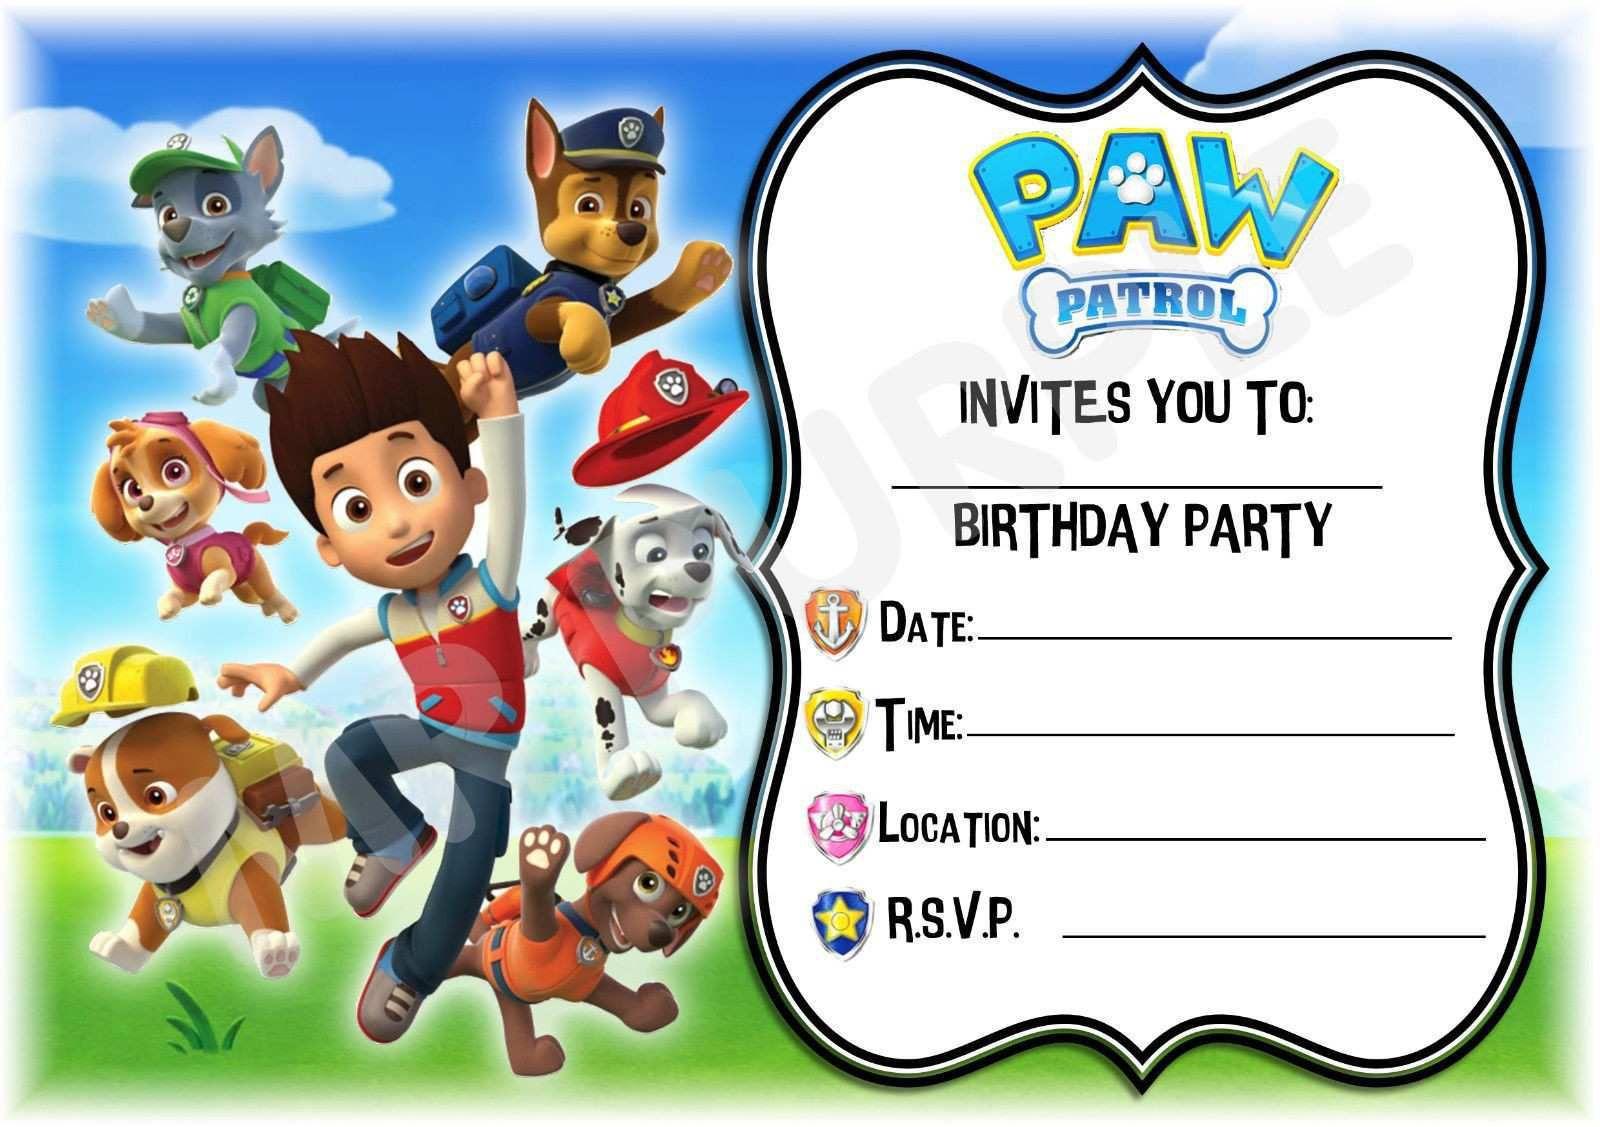 000 Unusual Paw Patrol Birthday Invitation Template Highest Quality  Party Invite Wording Skye FreeFull